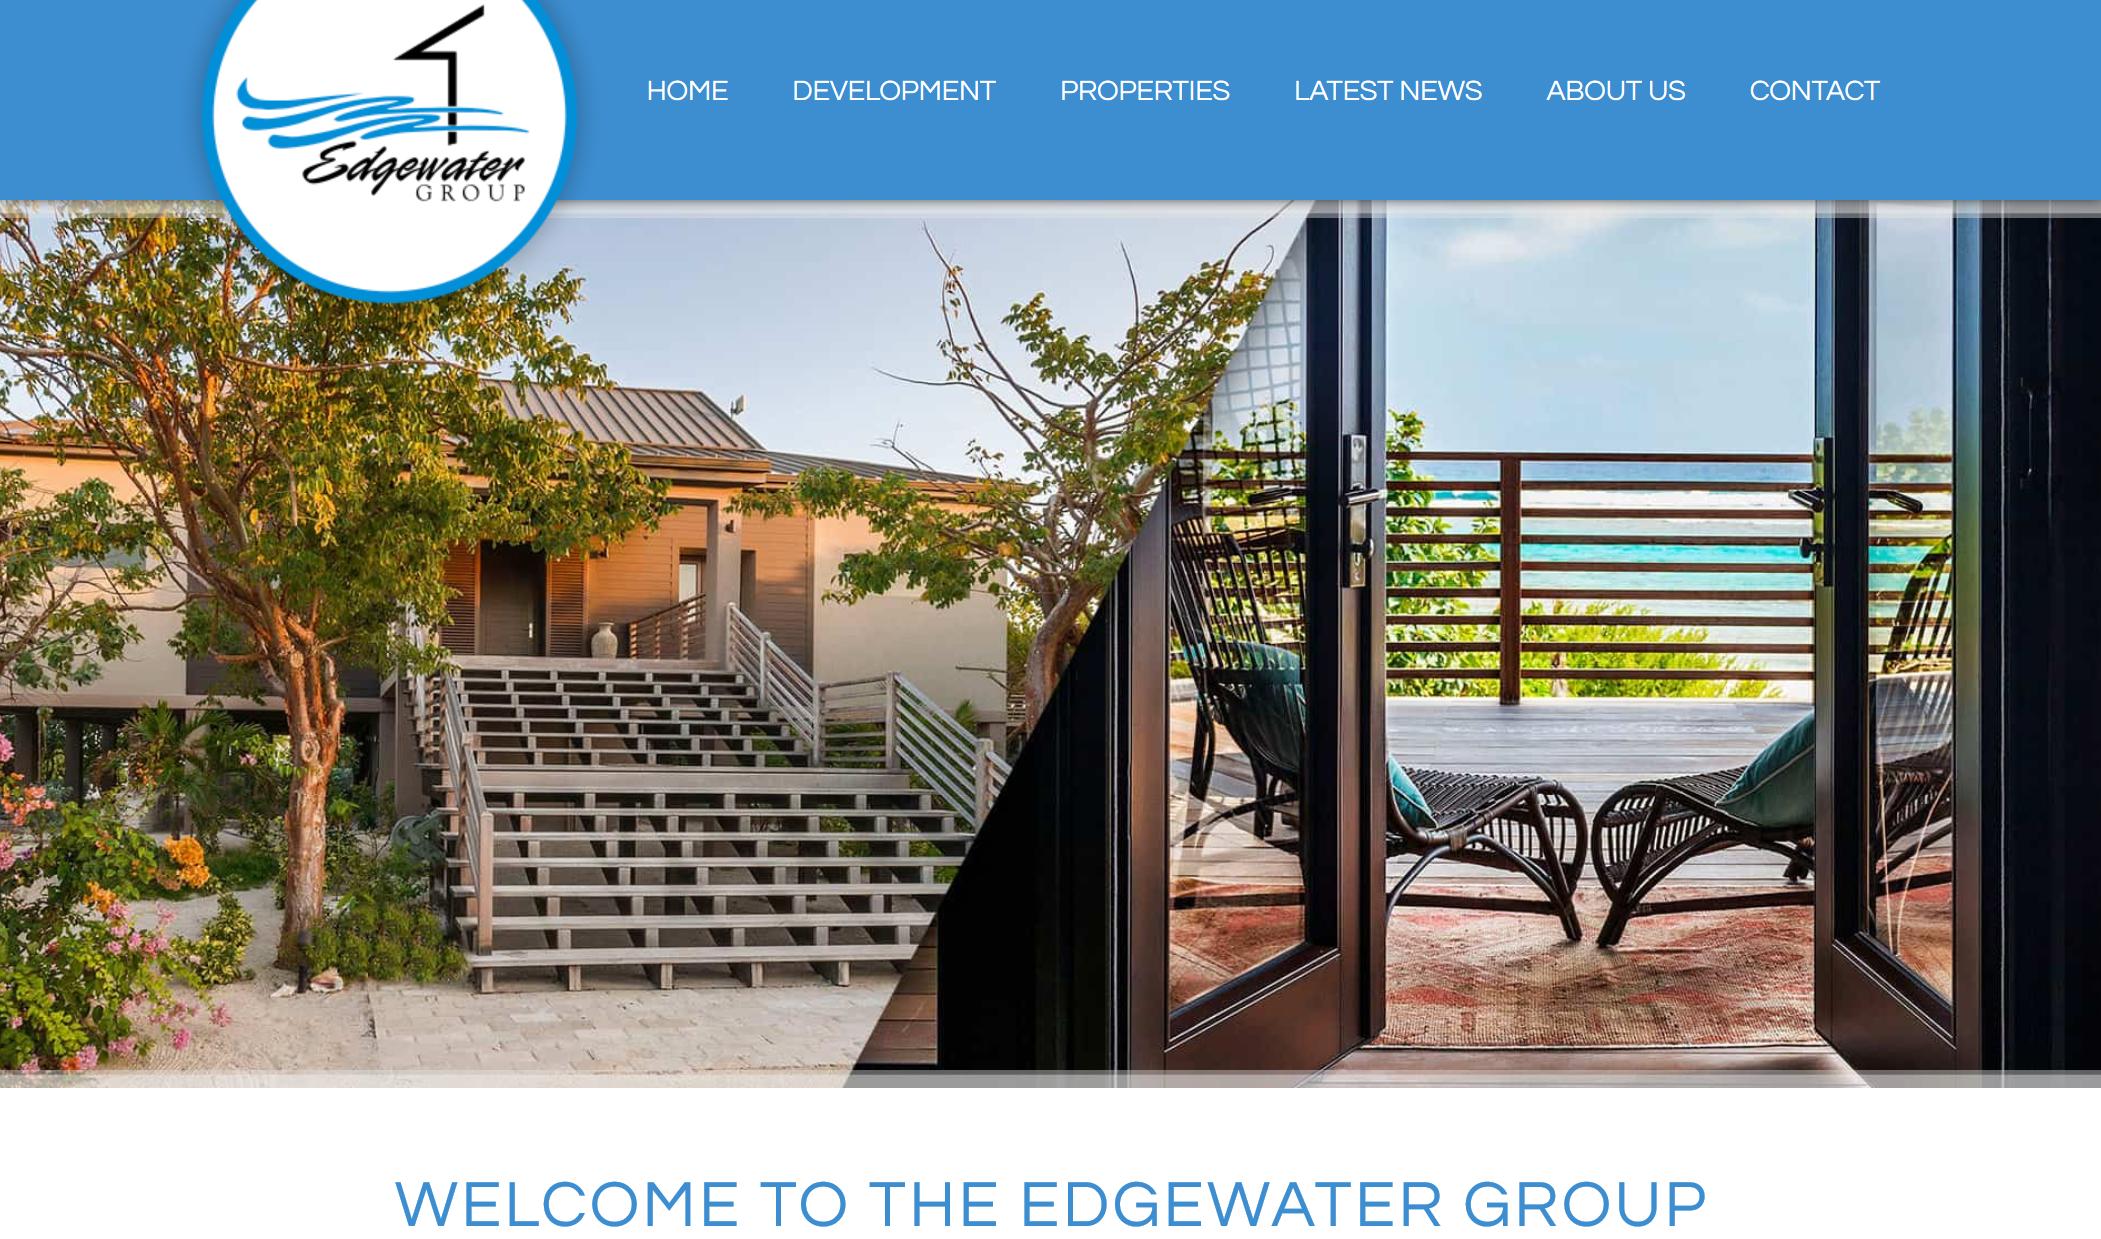 Edgewater Group - http://www.edgewater.ky/